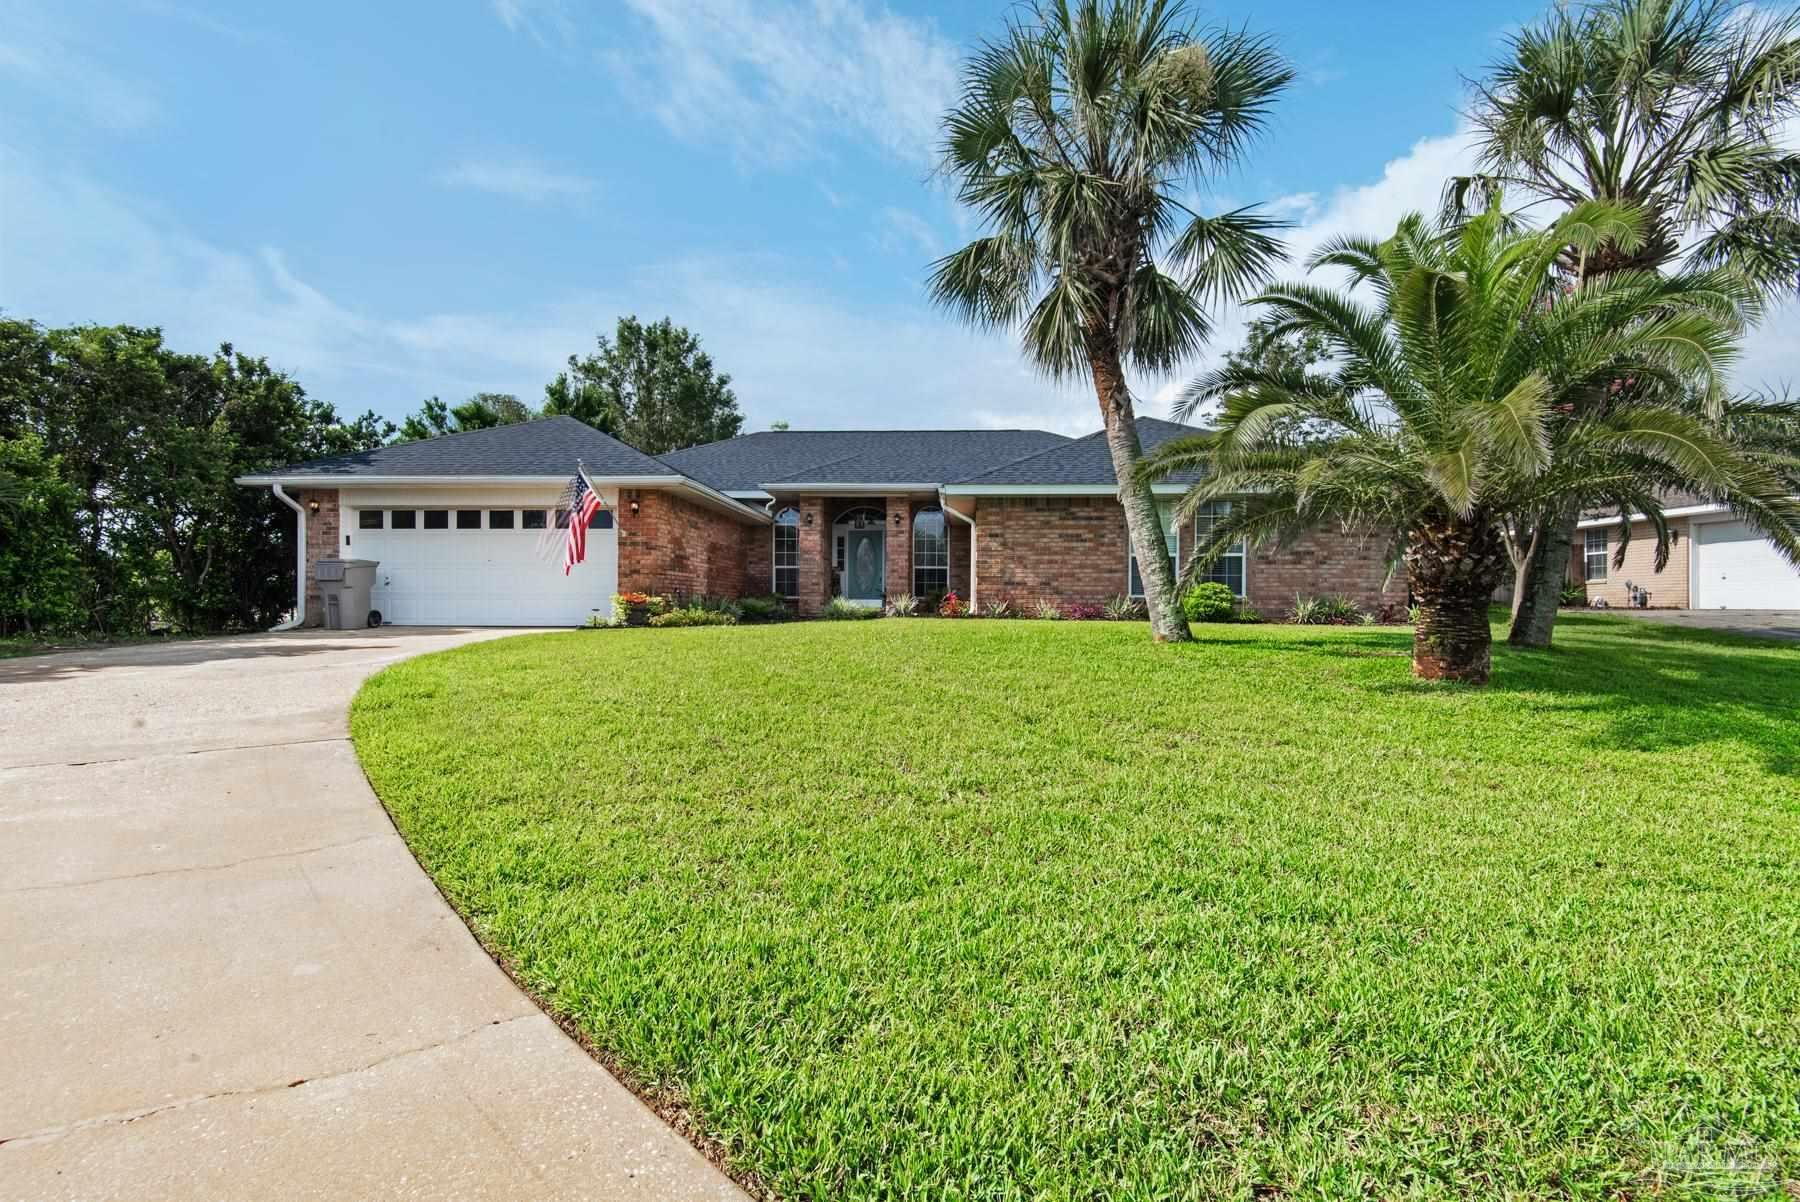 2975 CORSAIR DR, Pensacola, FL 32507 - MLS#: 593020